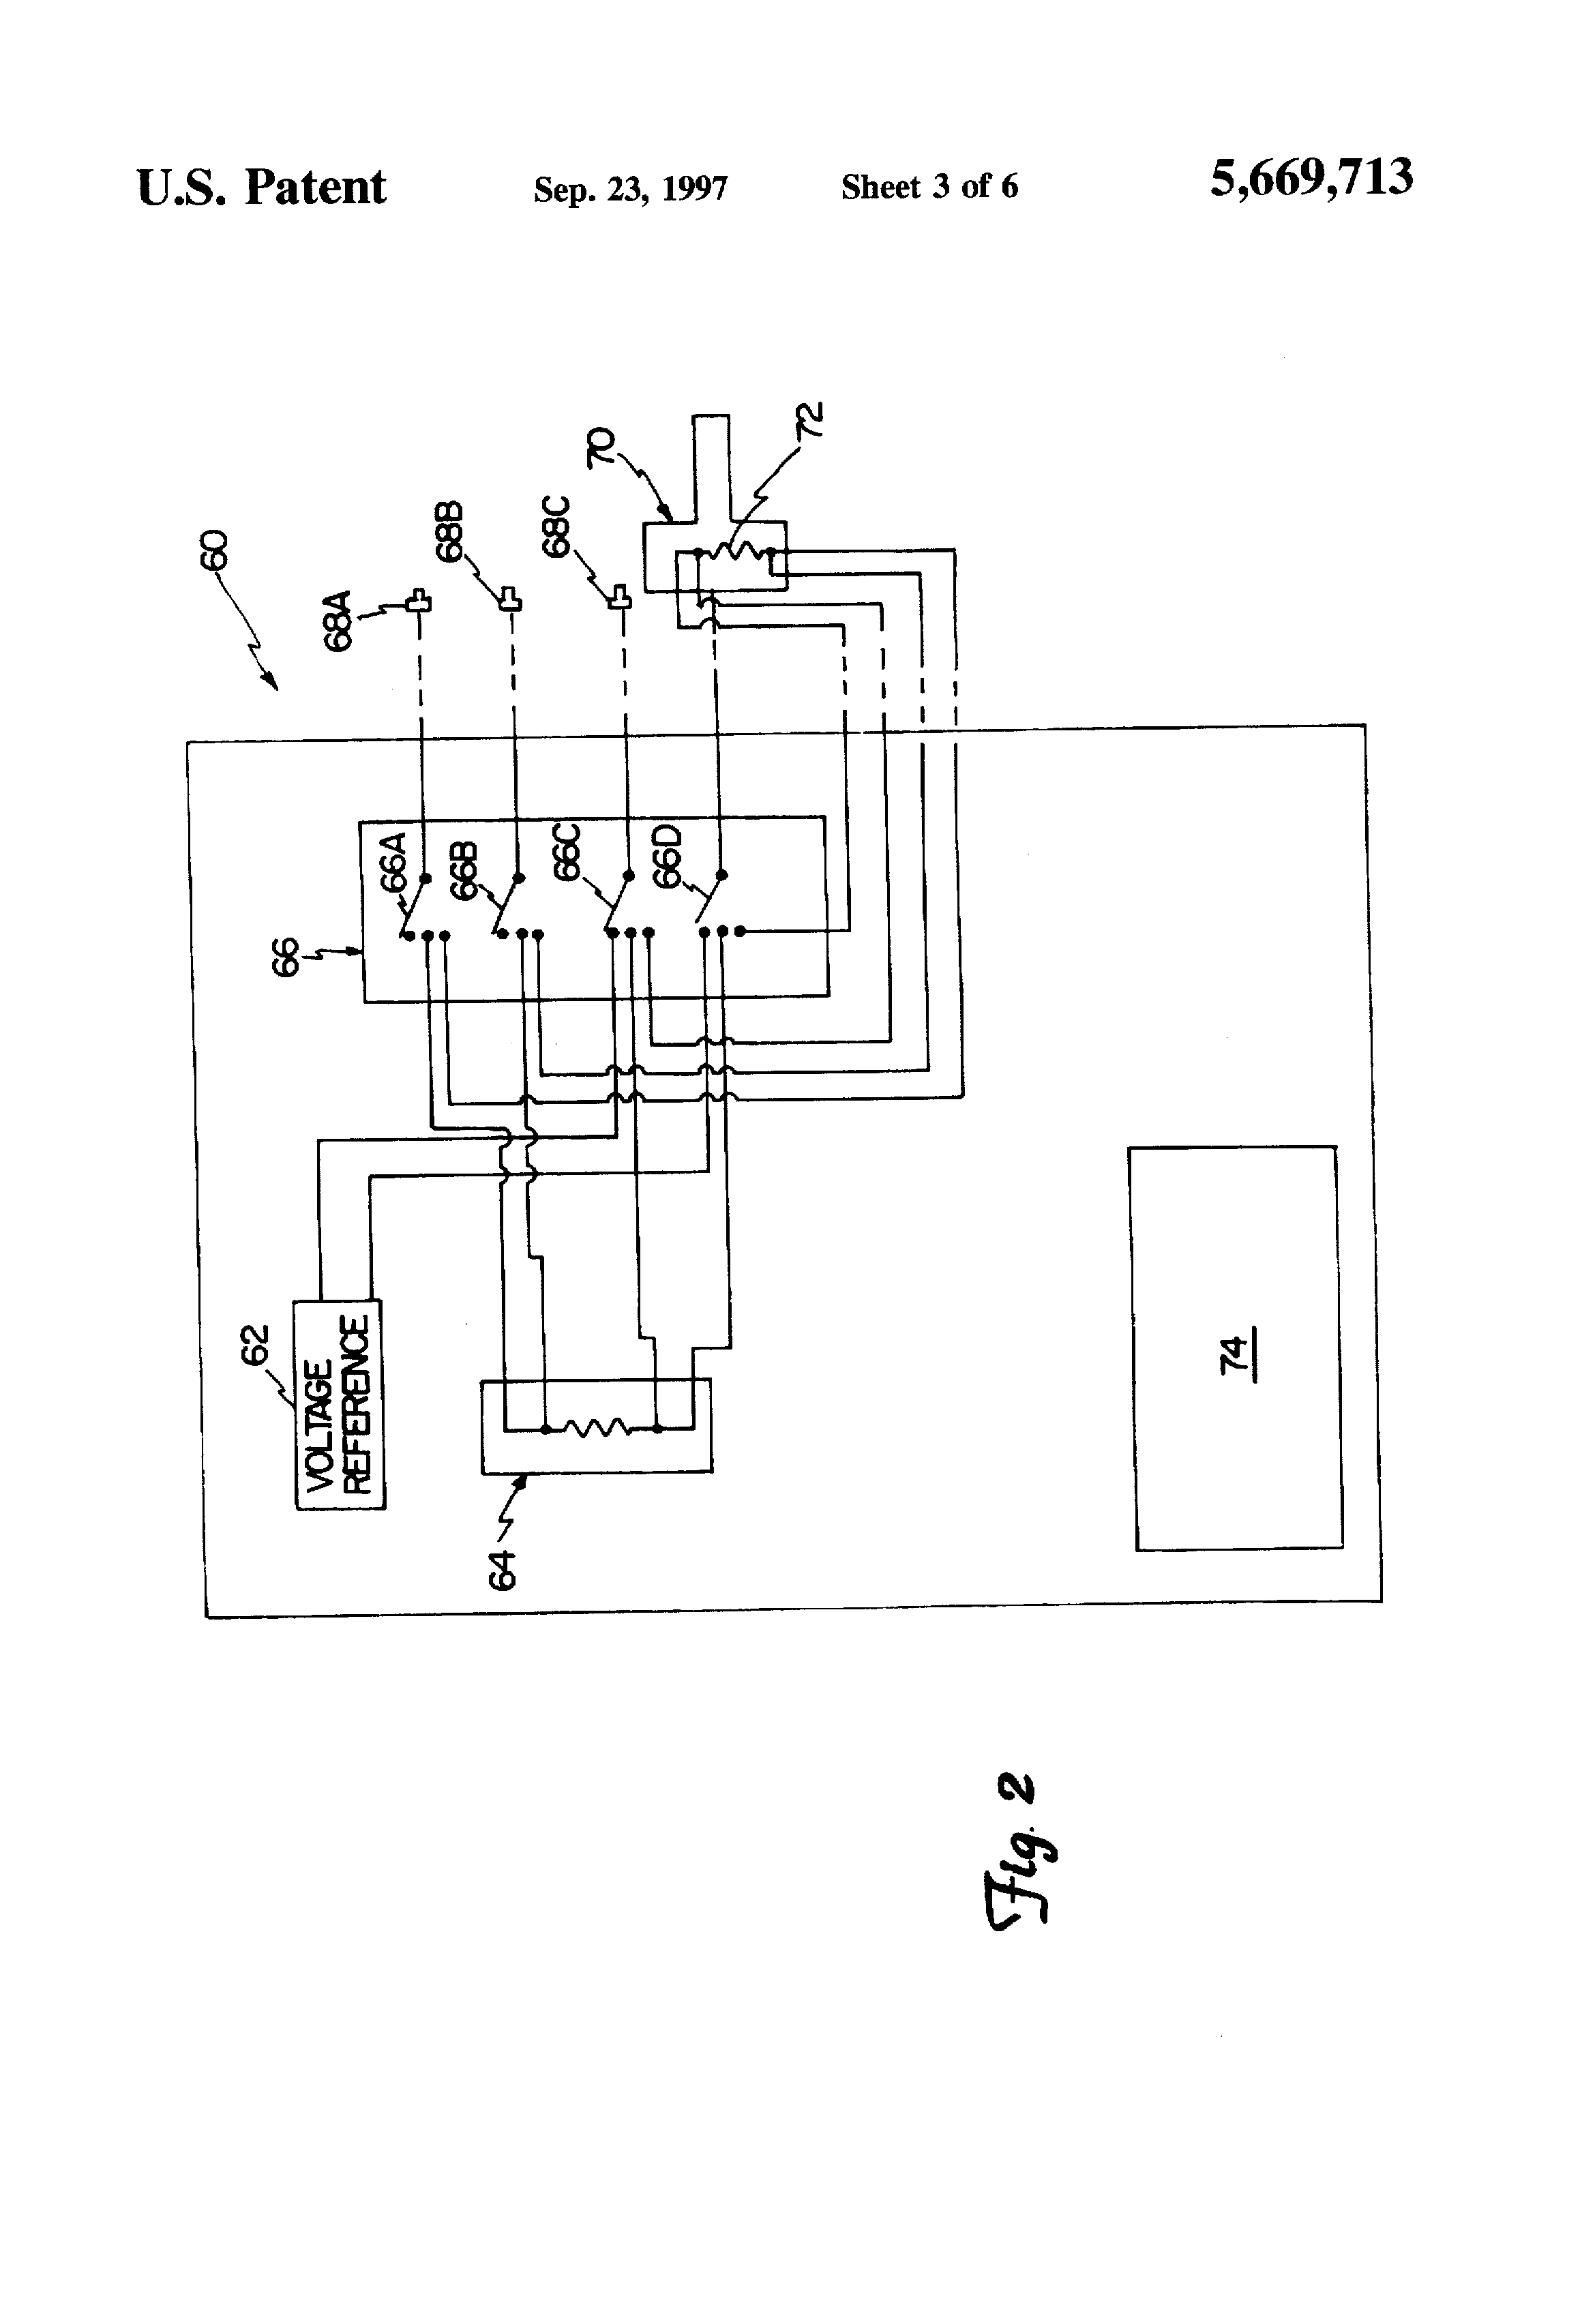 patent us calibration of process control temperature patent drawing